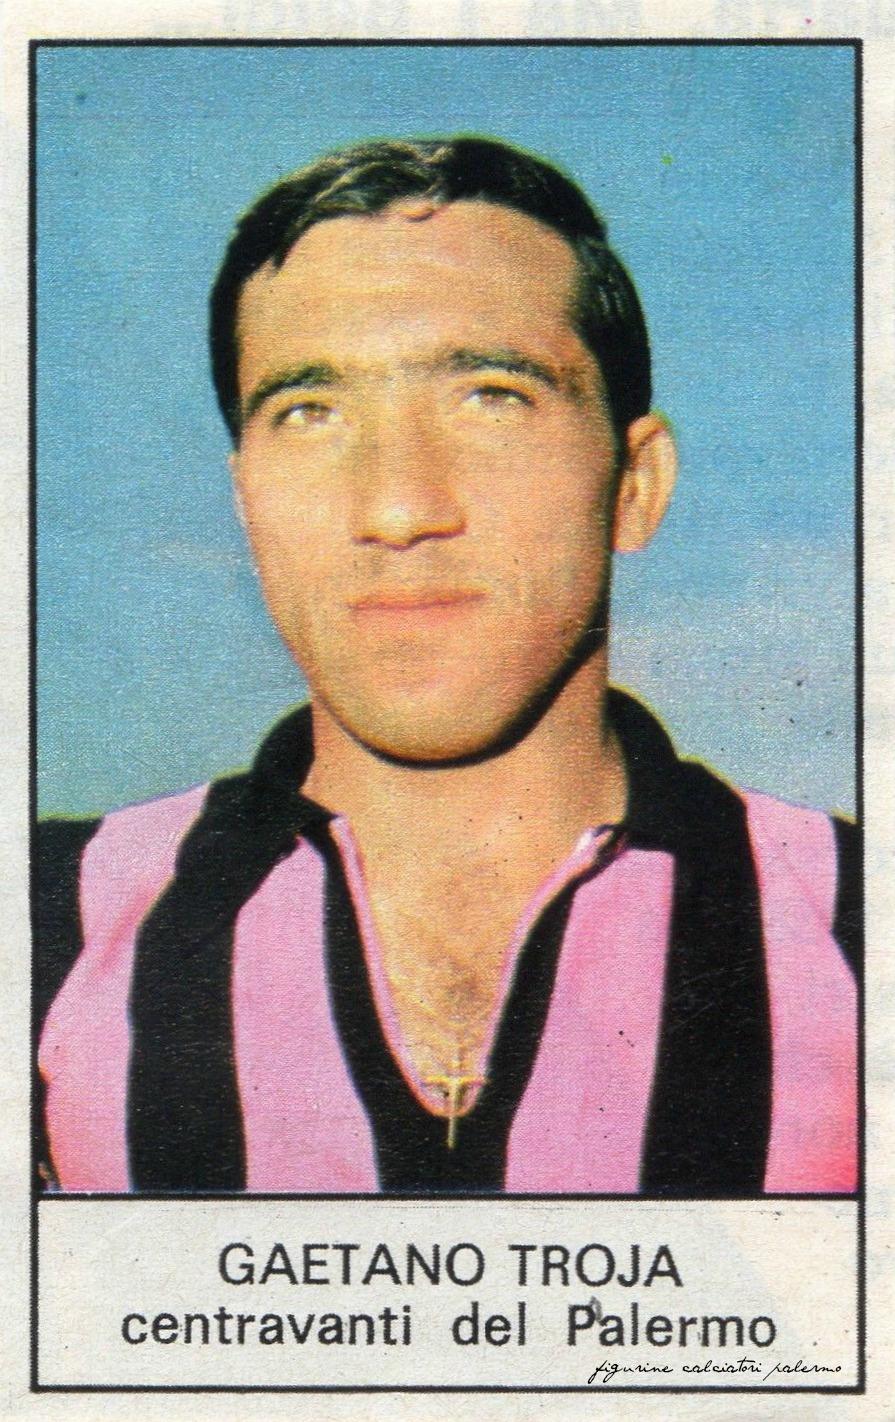 figurine-calciatori-palermo 1968-1969 Troja